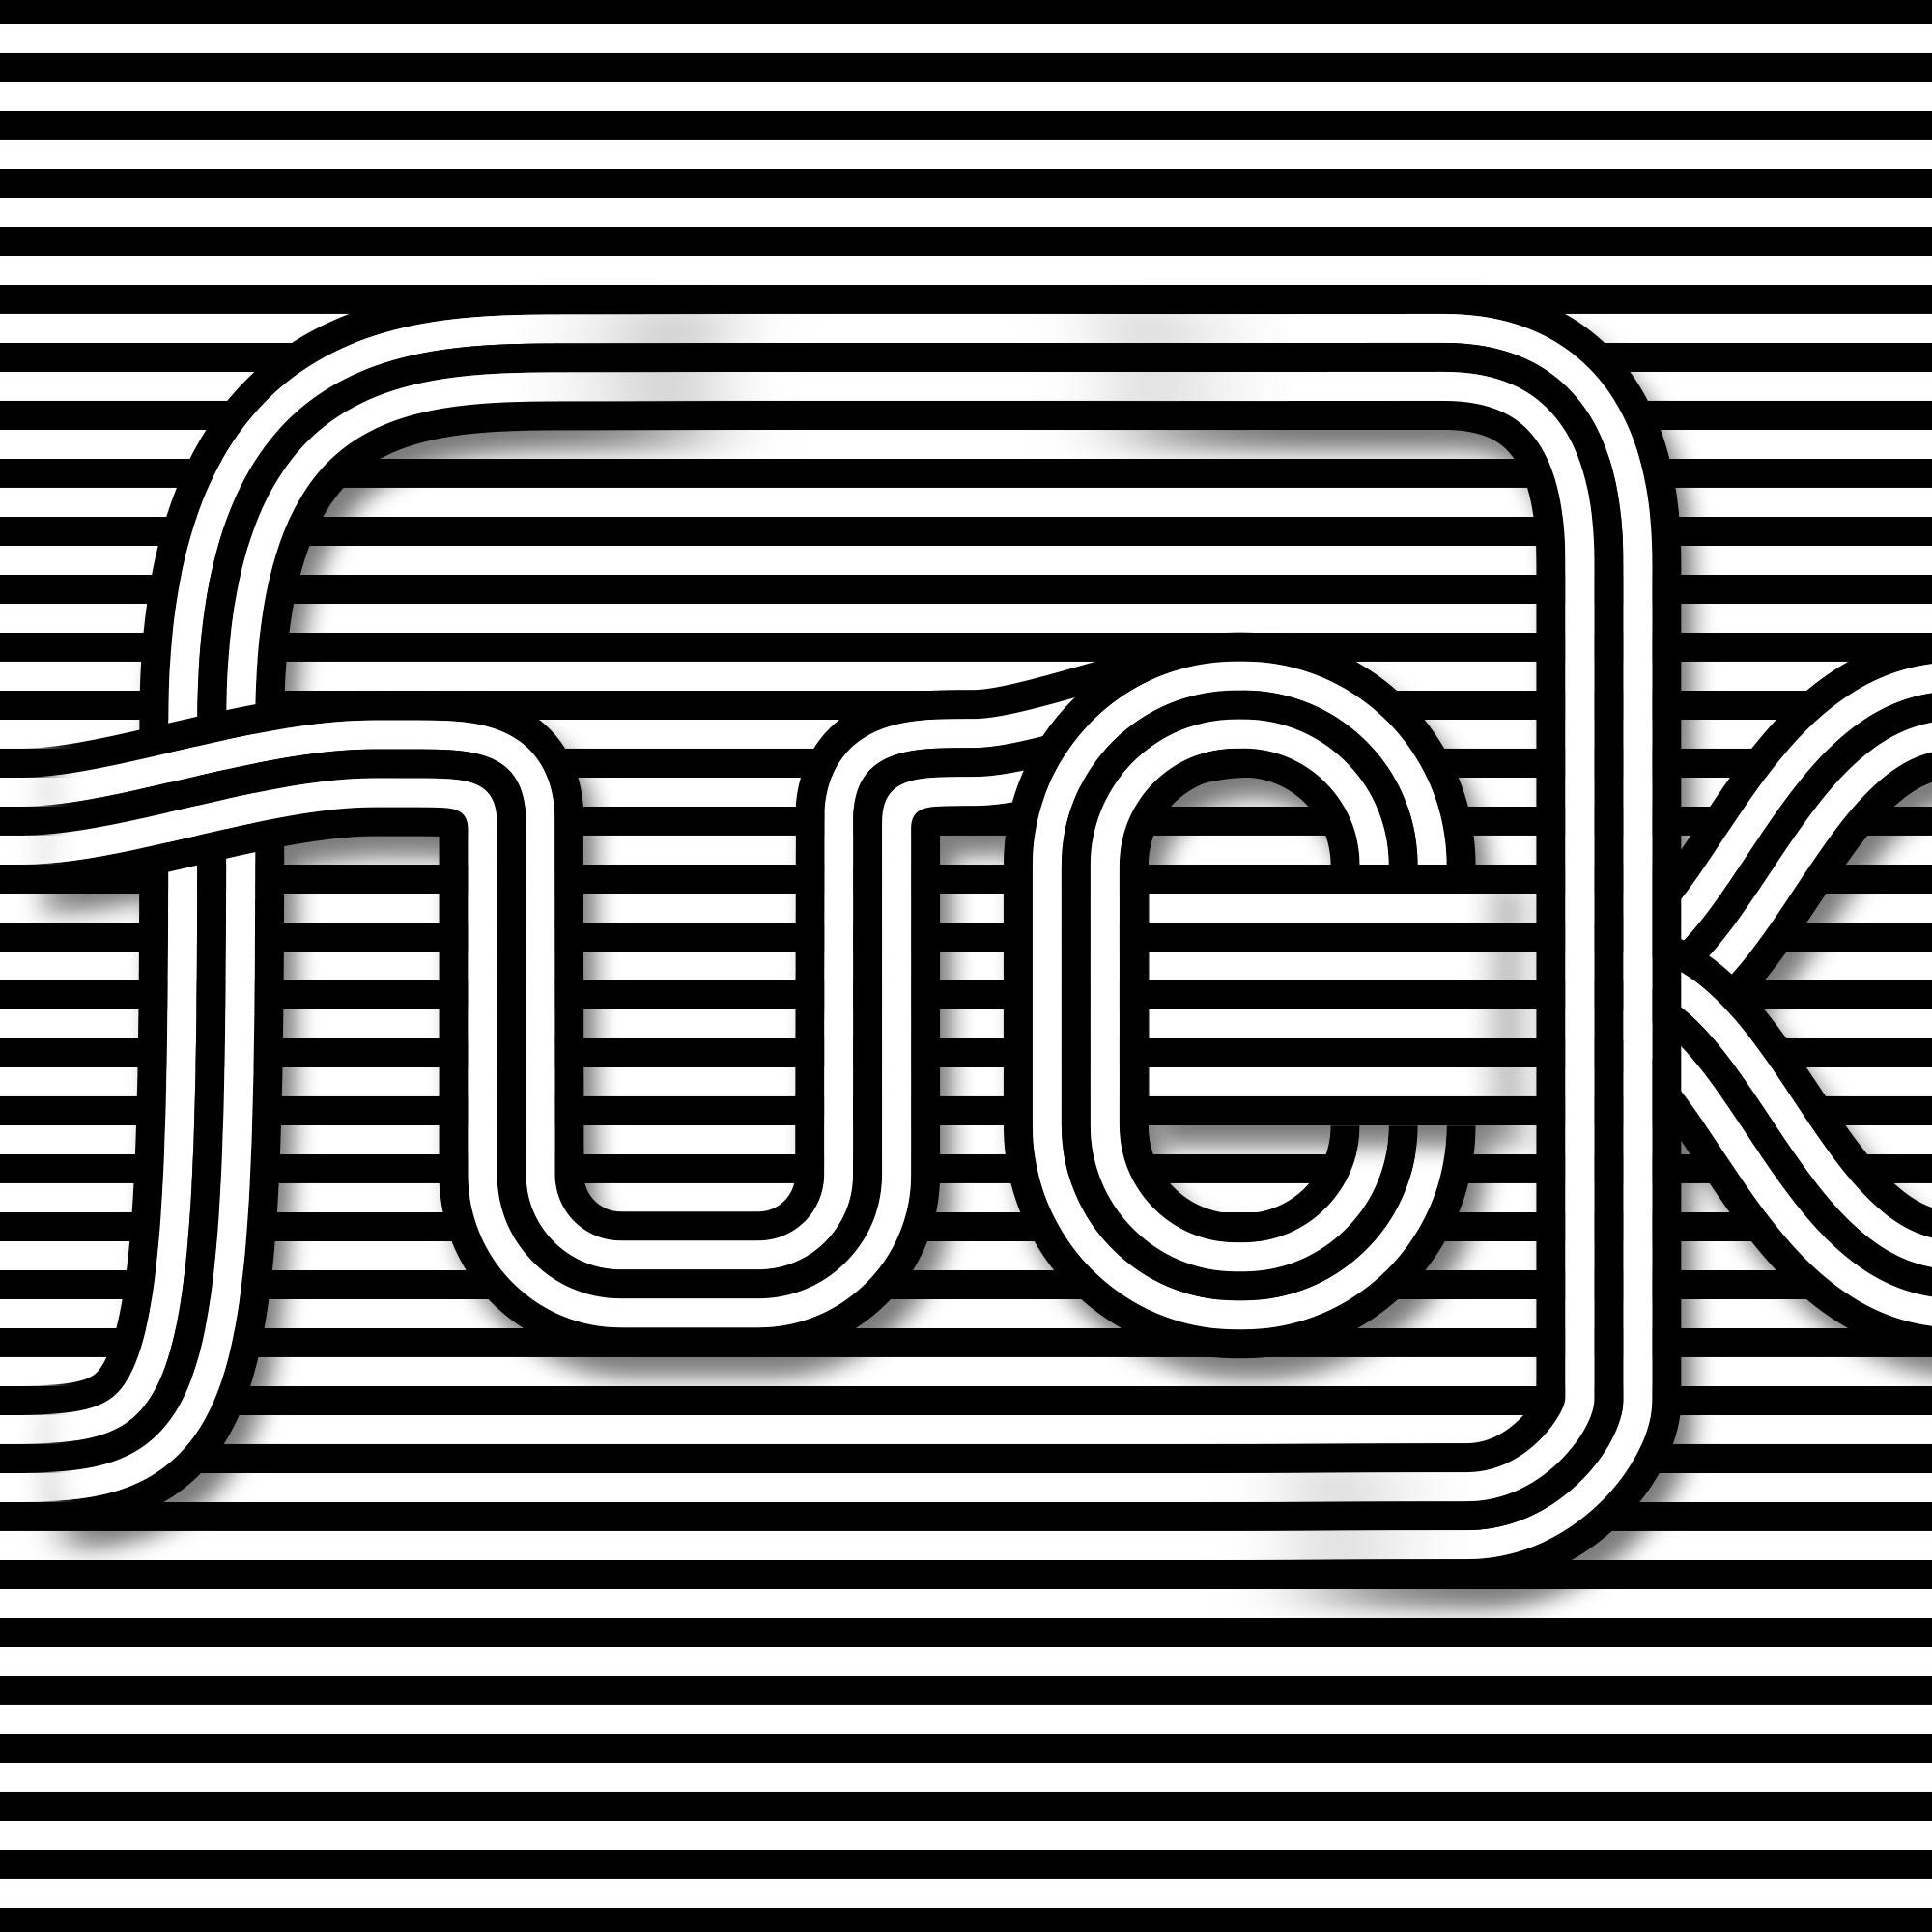 fucktype-3